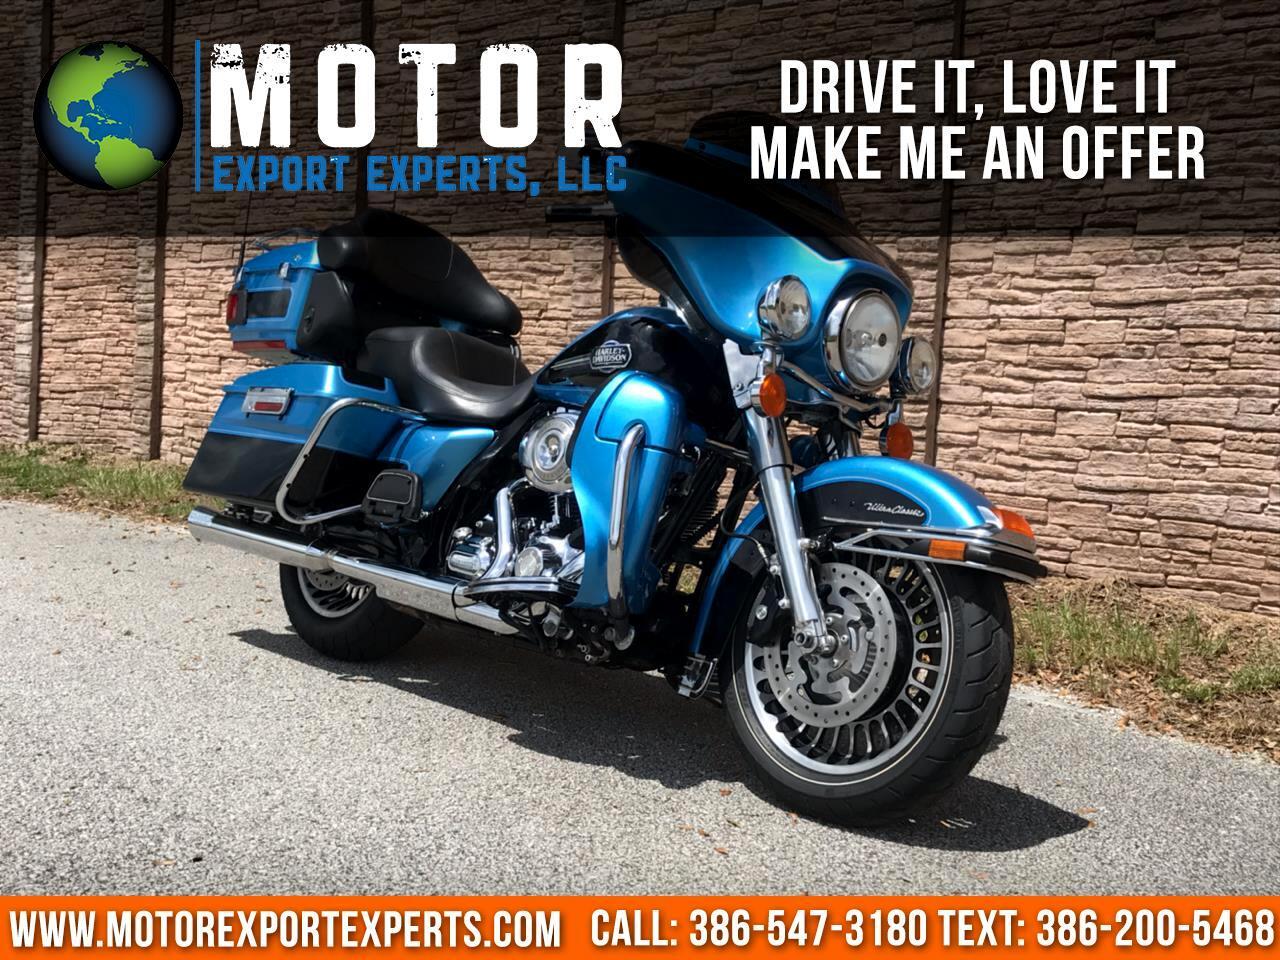 2011 Harley-Davidson FLHTCU ultra classic